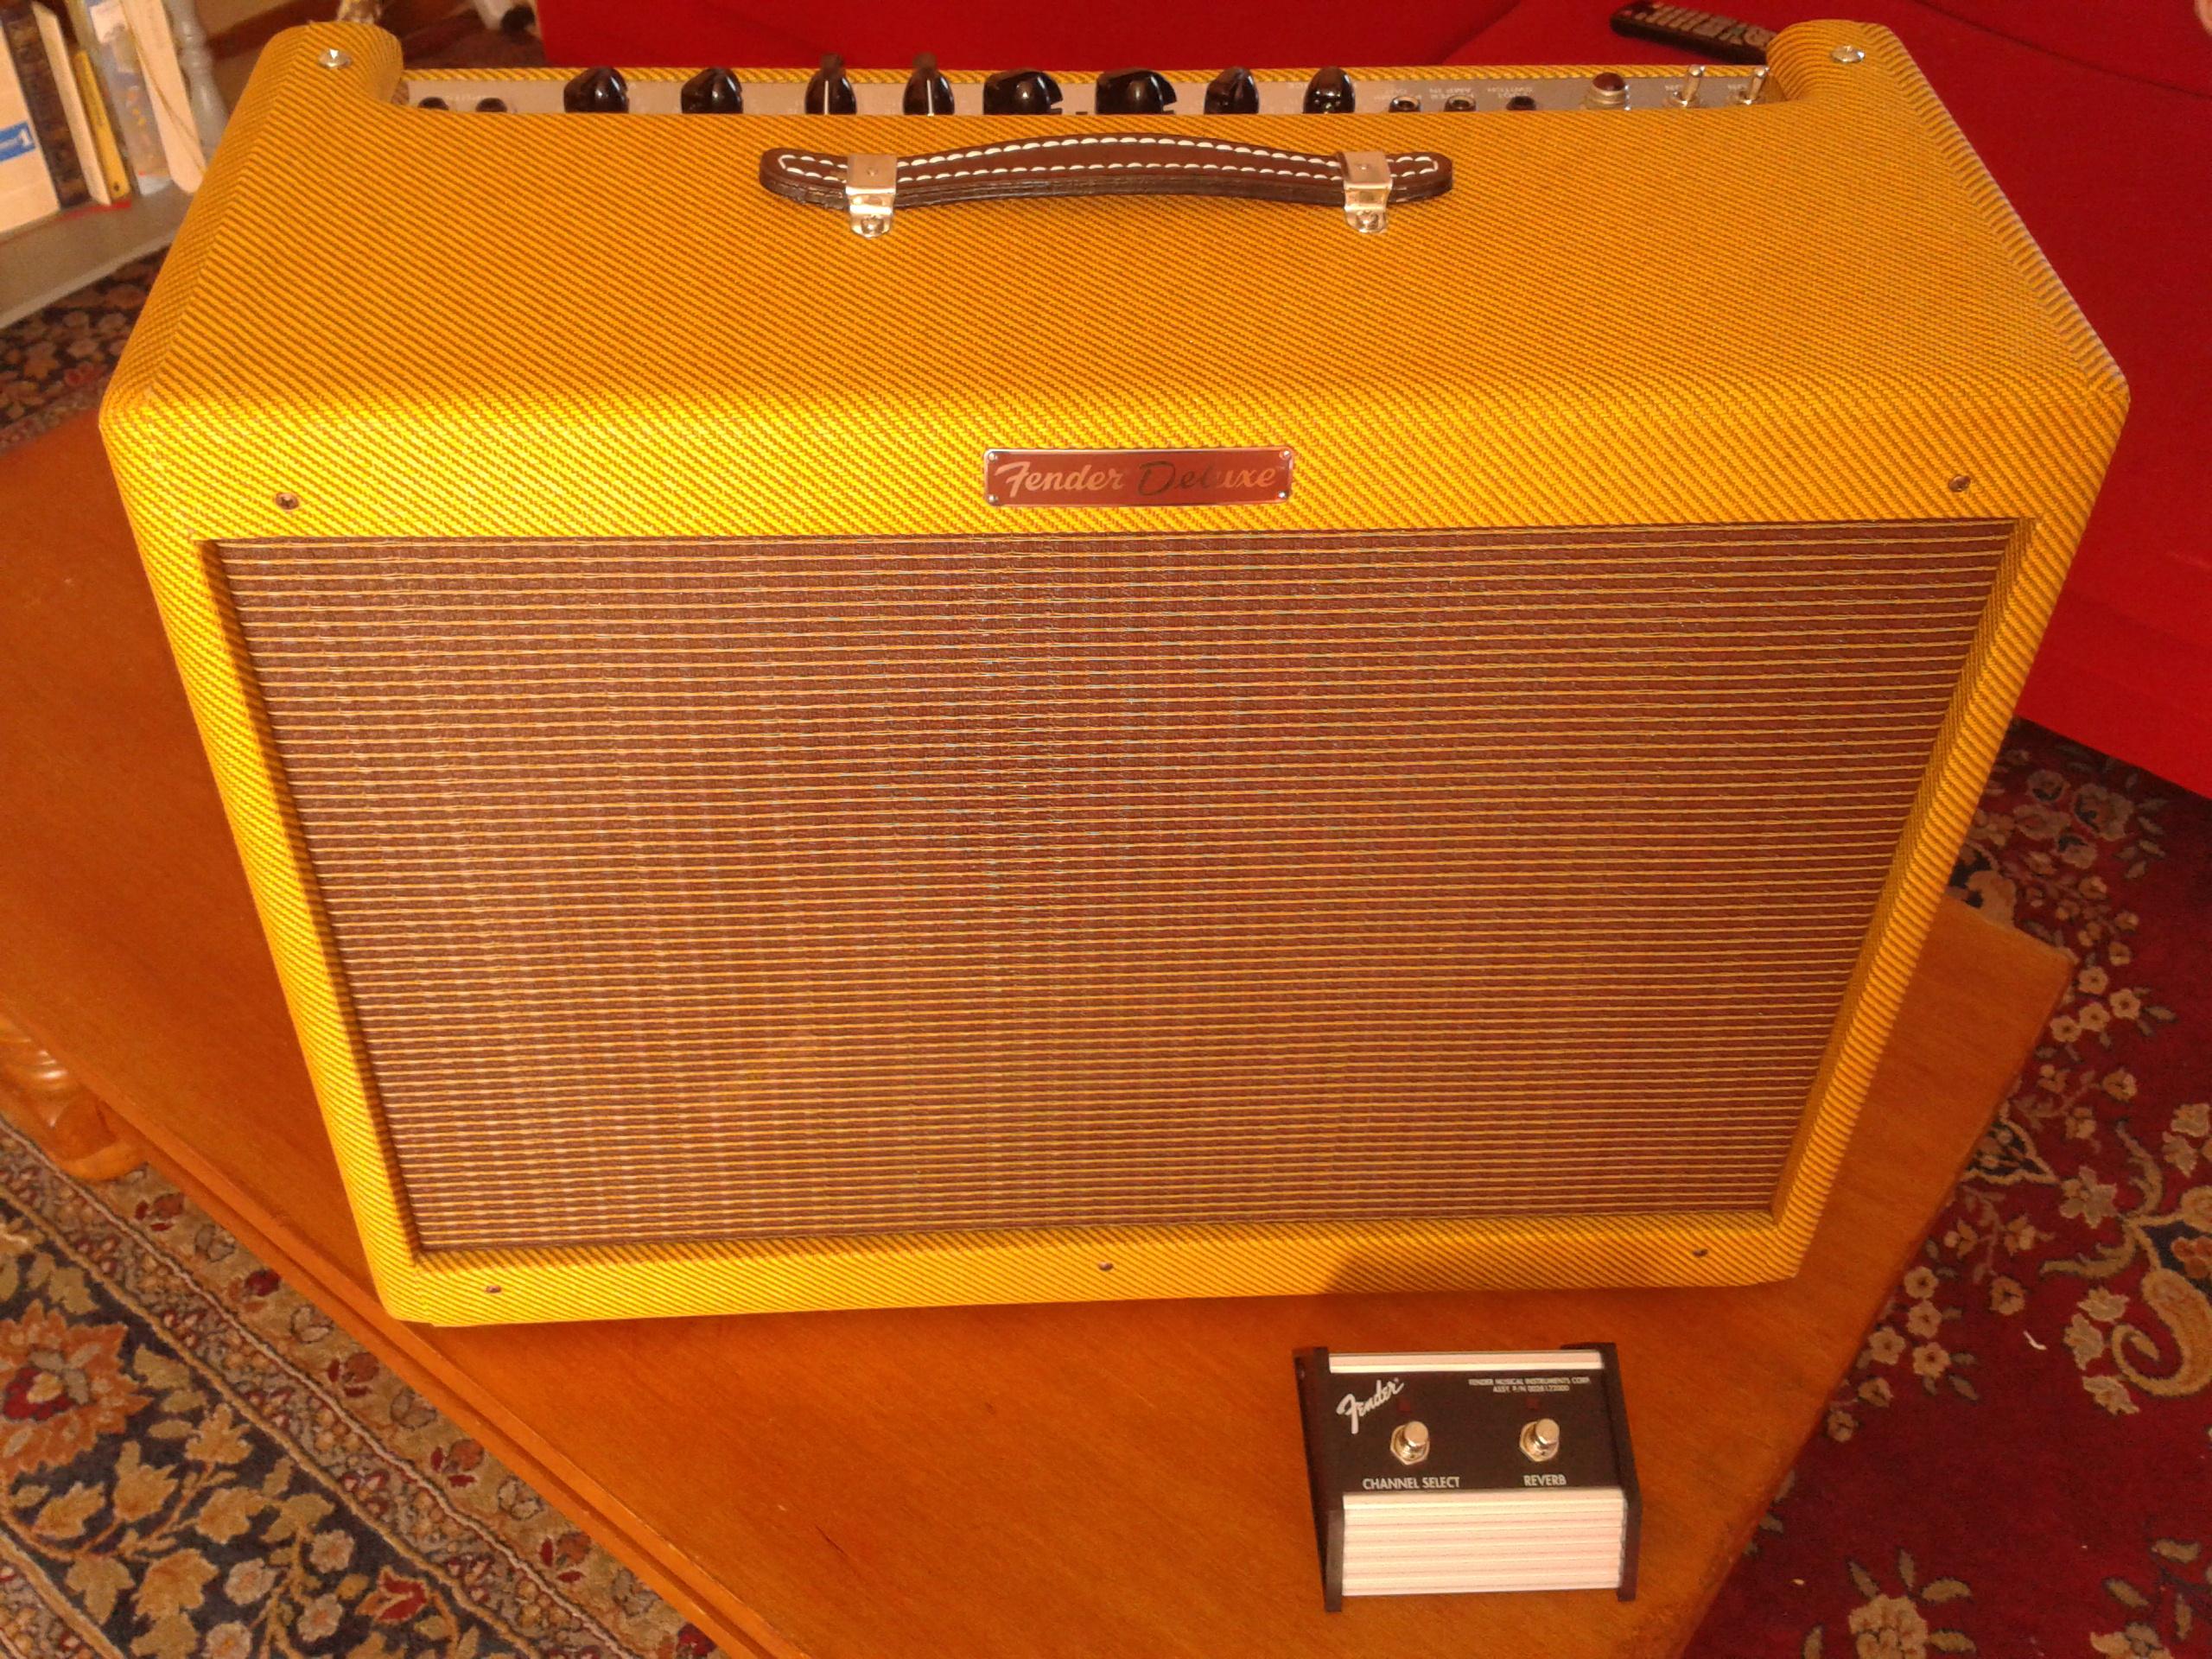 Fender Blues Deluxe Quot Smoky Tweed Quot Image 778453 border=